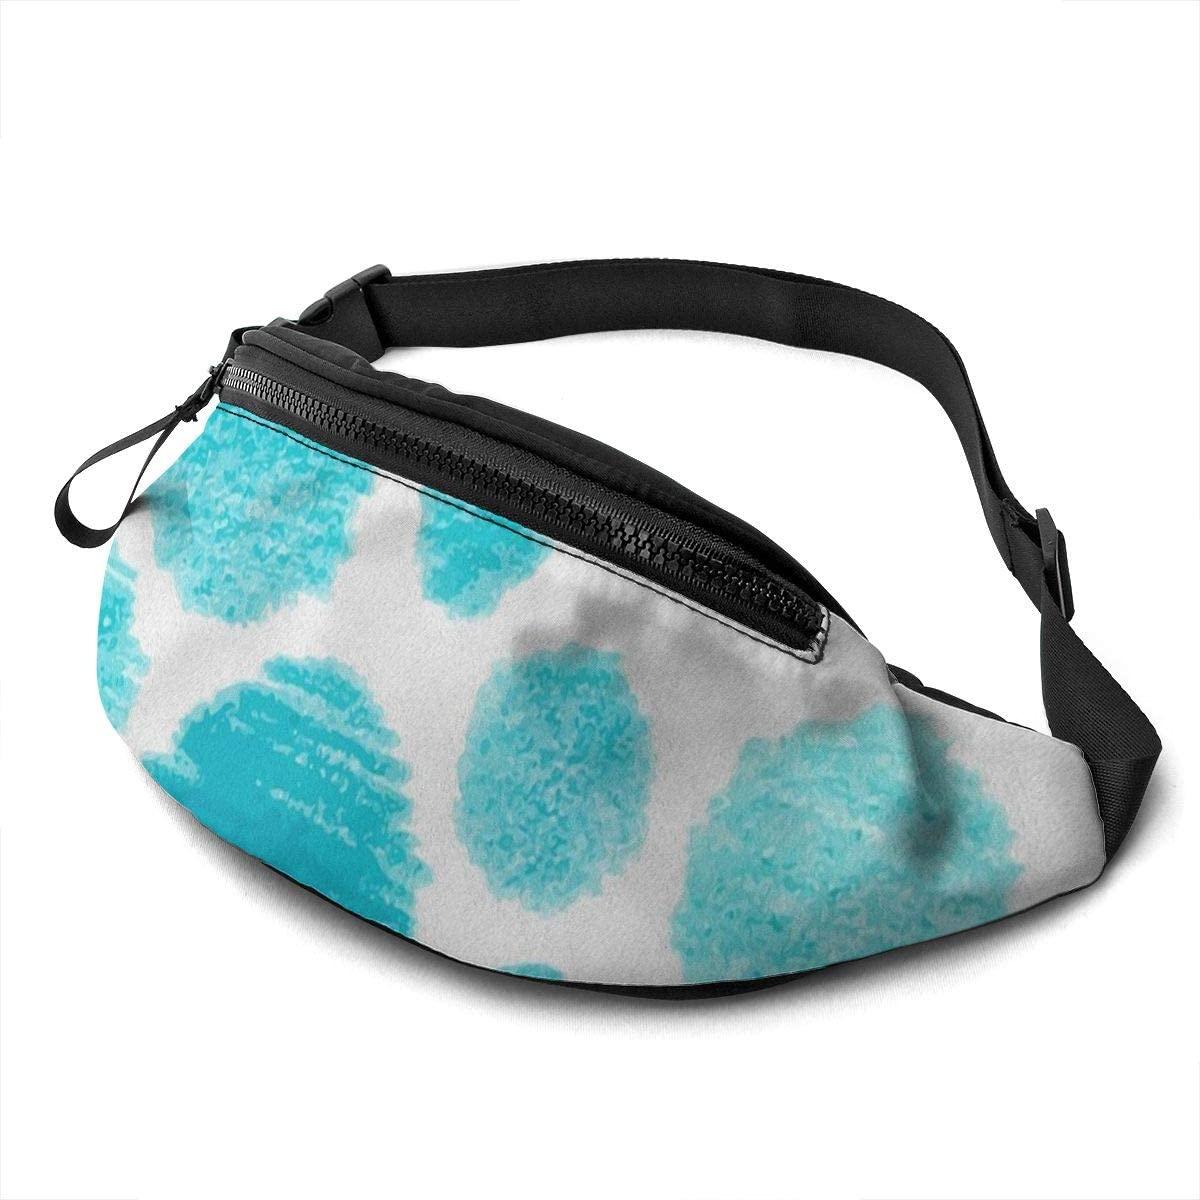 blue spots Fanny Pack for Men Women Waist Pack Bag with Headphone Jack and Zipper Pockets Adjustable Straps